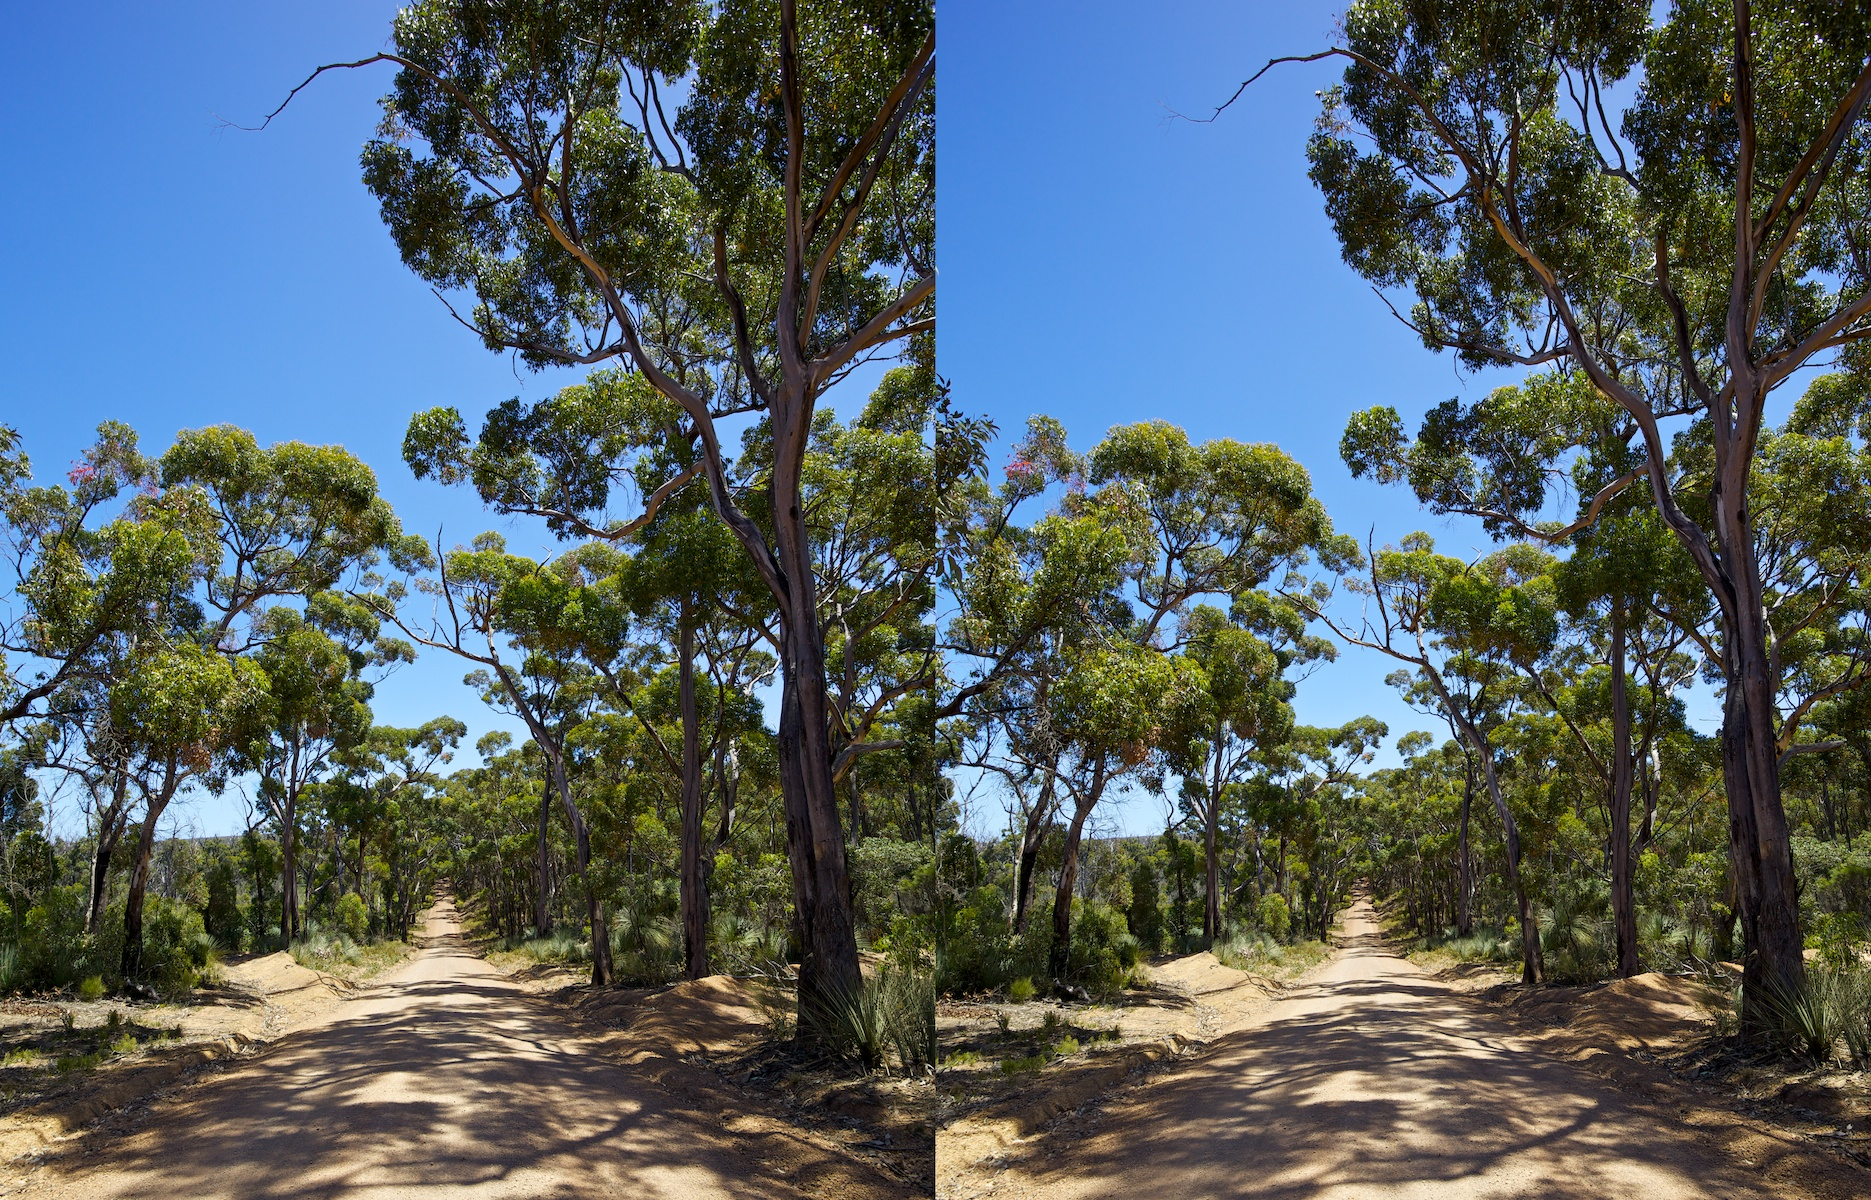 2011 South Australia, Kangaroo Island, Остров Кенгуру, Южная Австралия, Flinders Chase, forrest, лес, road, дорога, 3D, stereo, cross-eyed, стерео